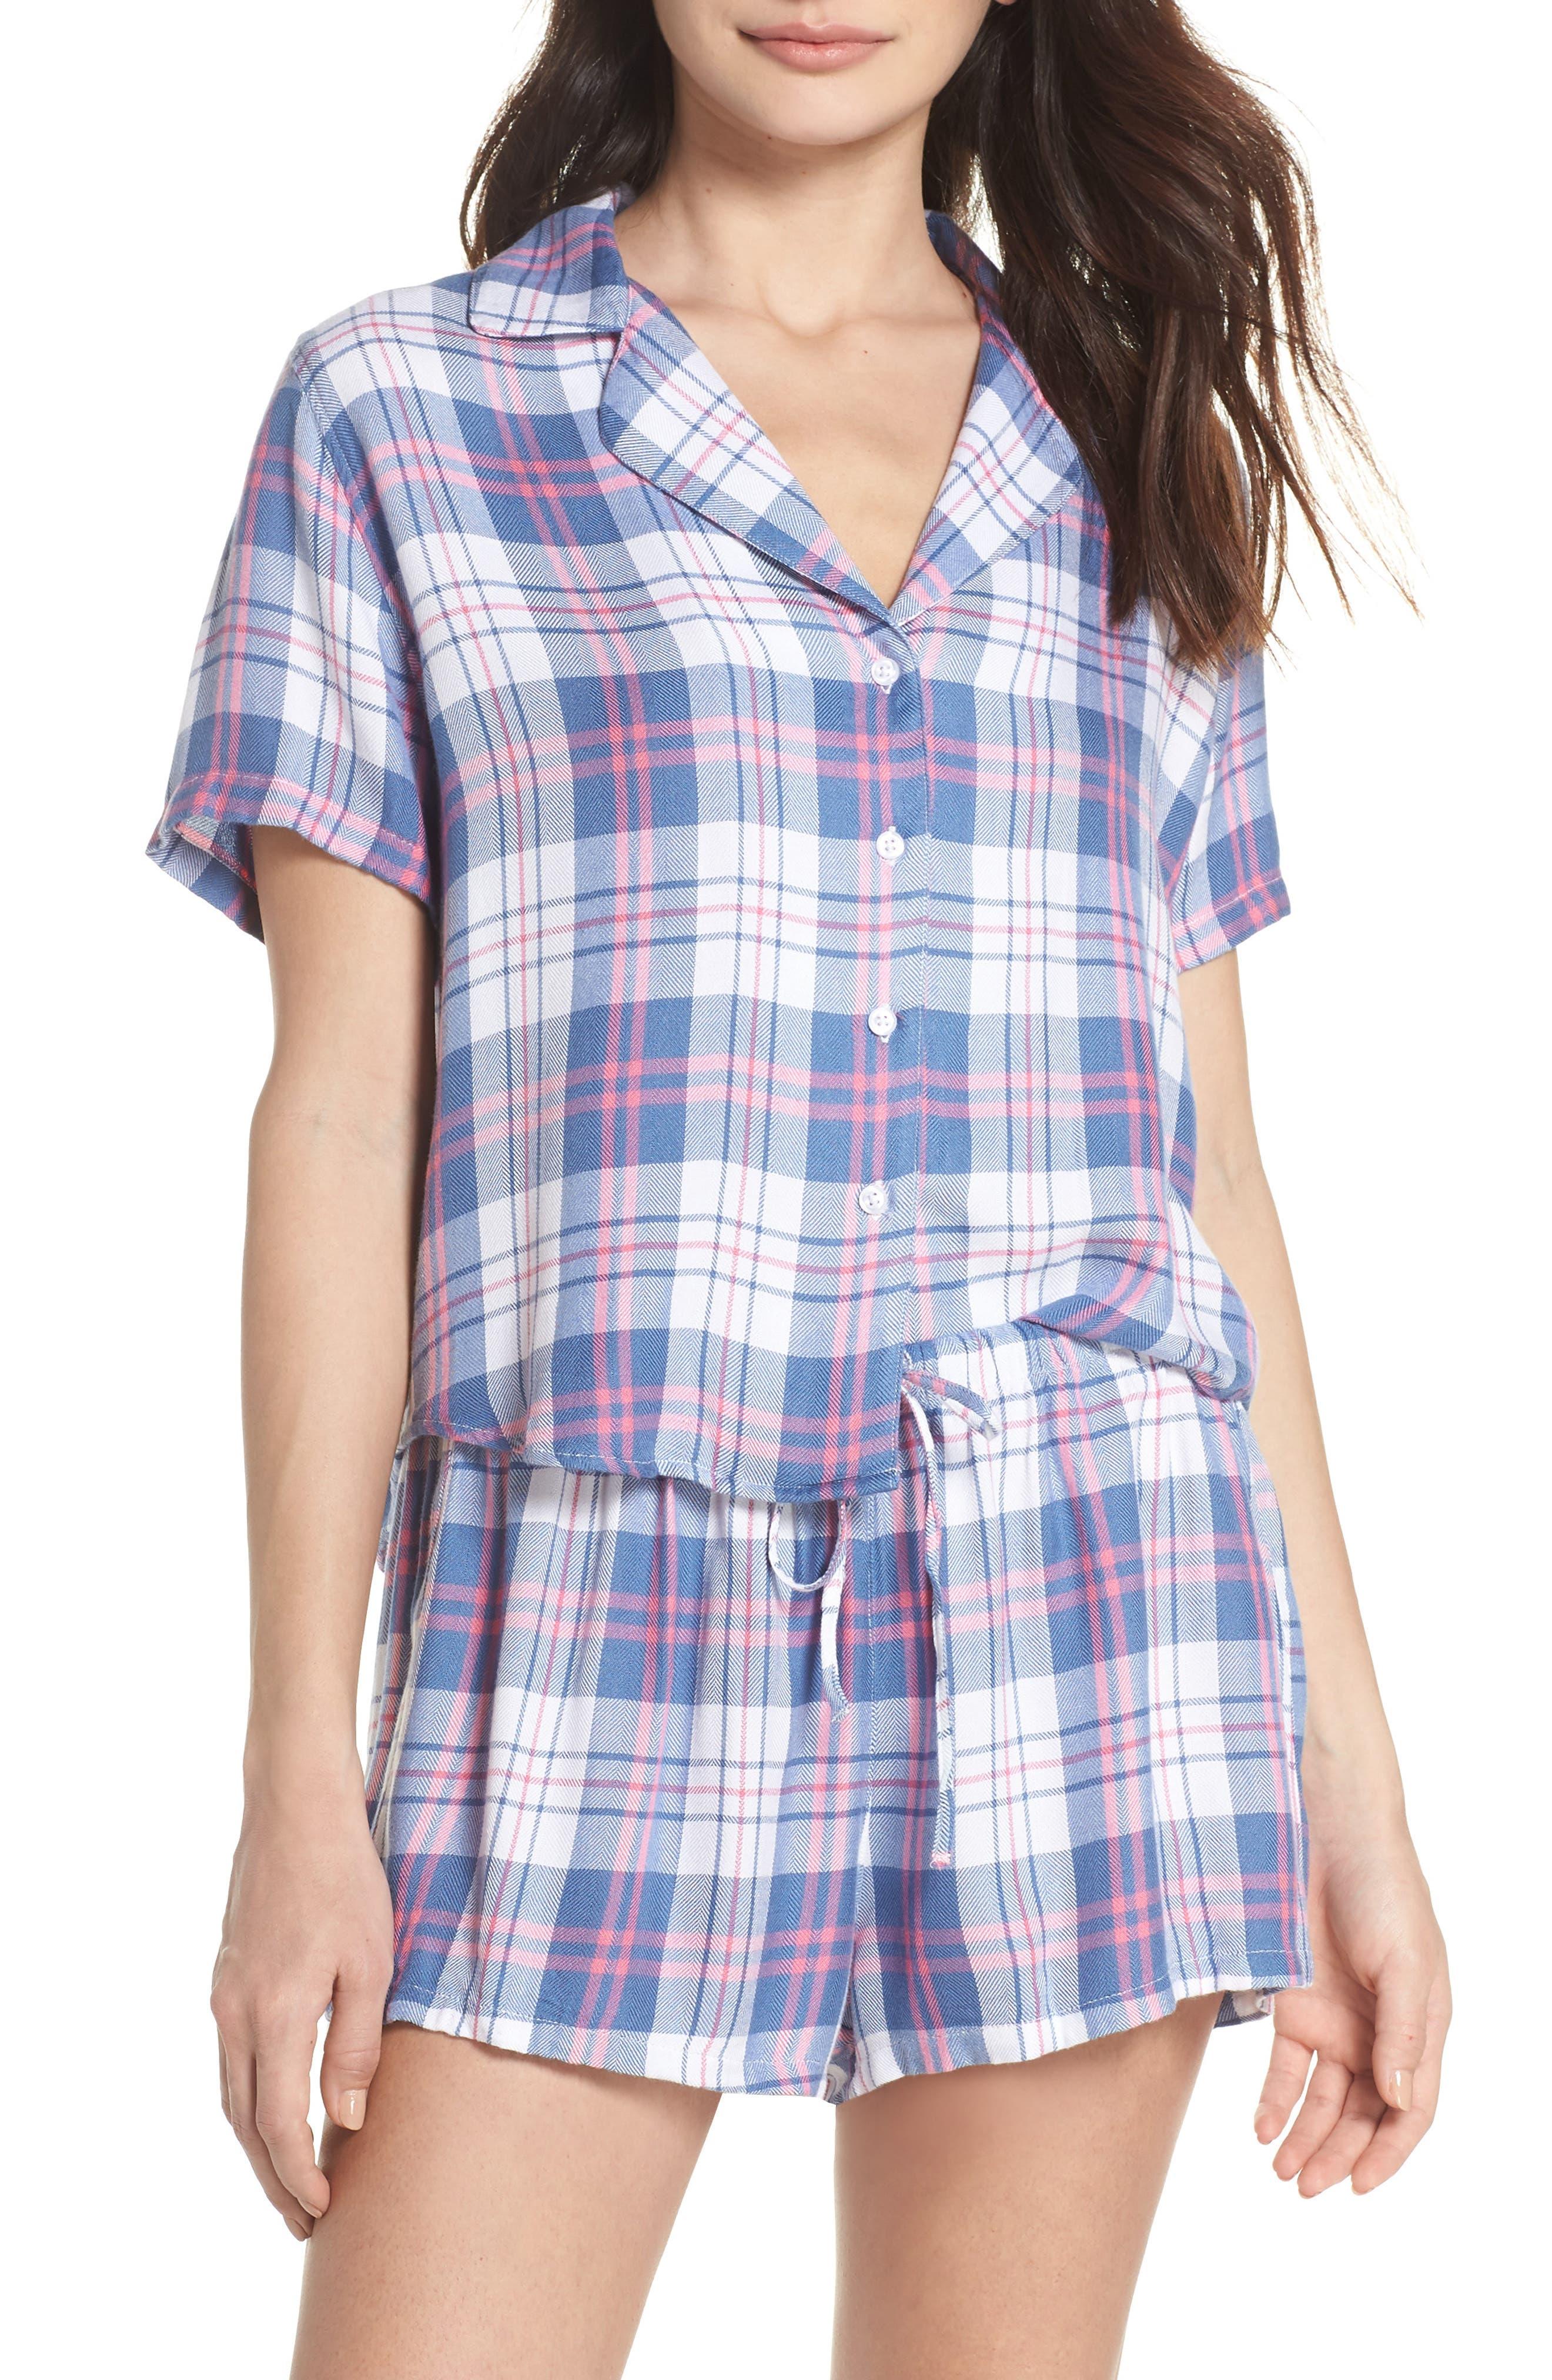 Plaid Short Pajamas,                             Main thumbnail 1, color,                             Watermelon Coast White